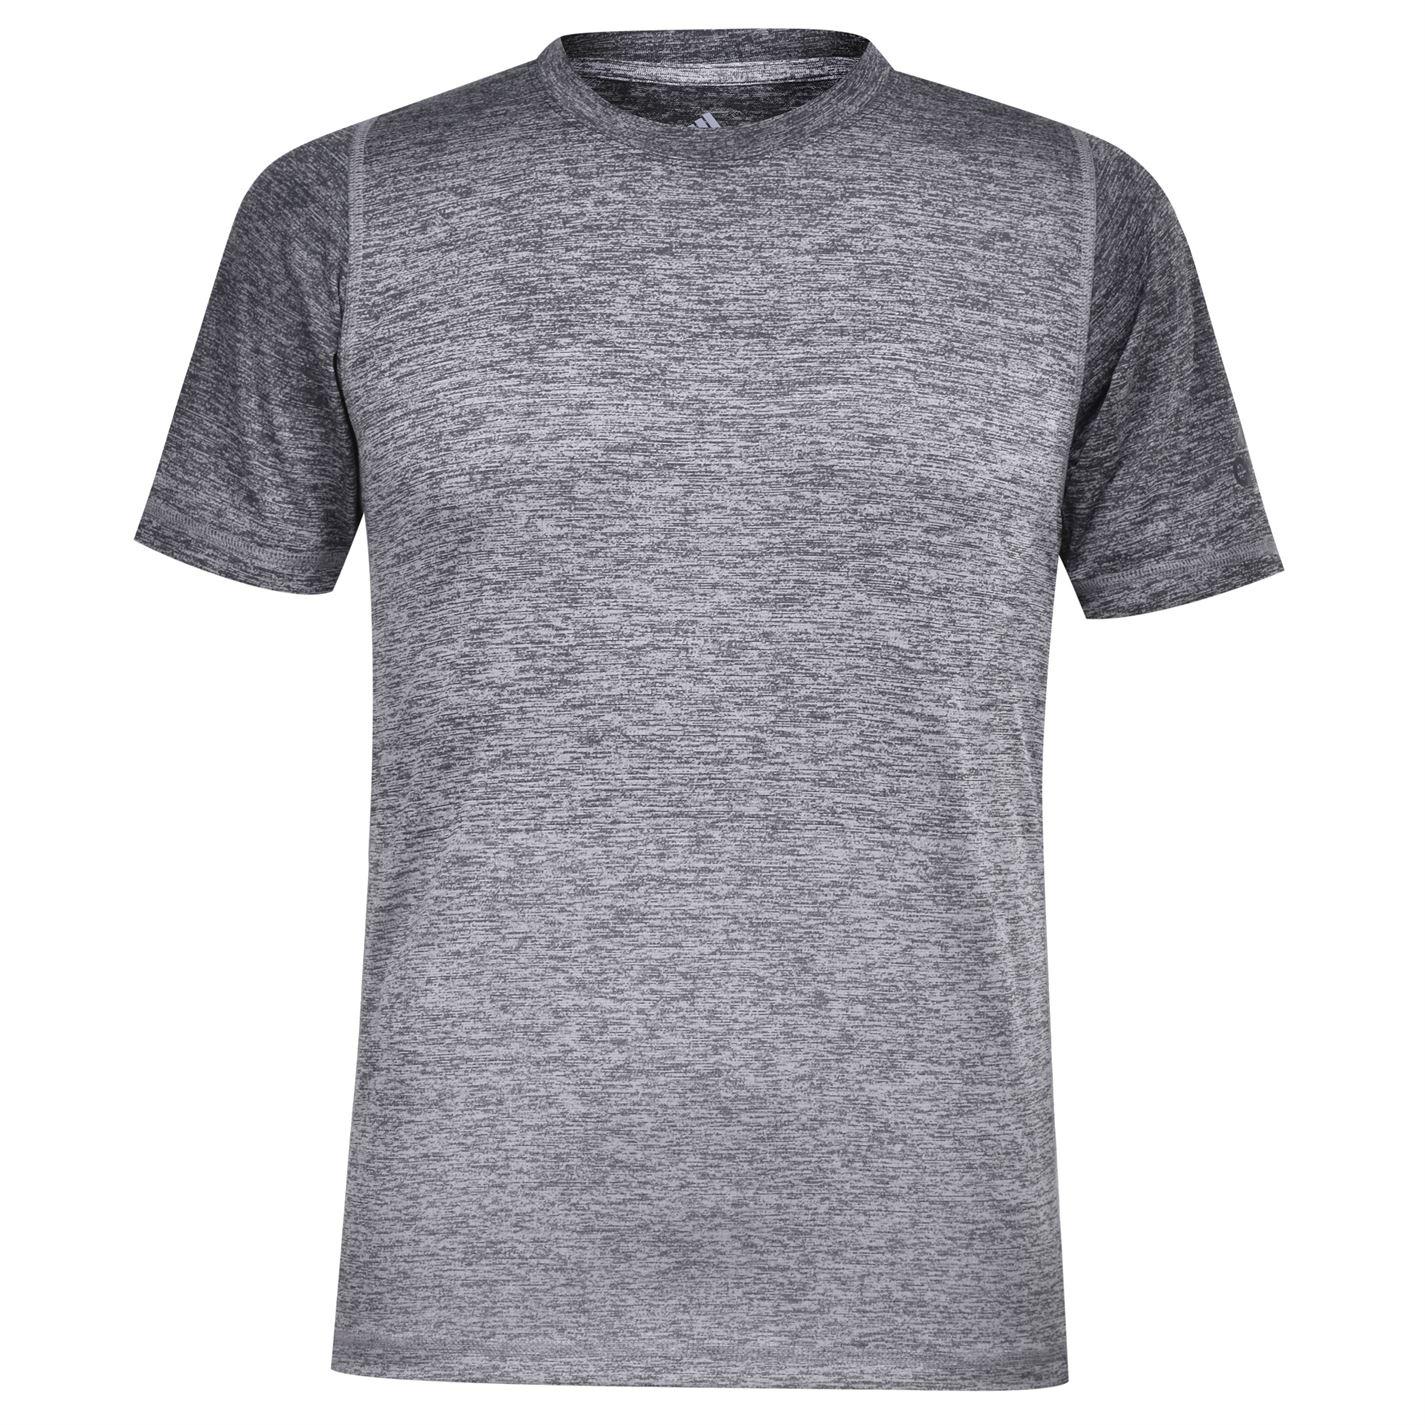 Adidas Freelift 360 Gradient Mens T-Shirt